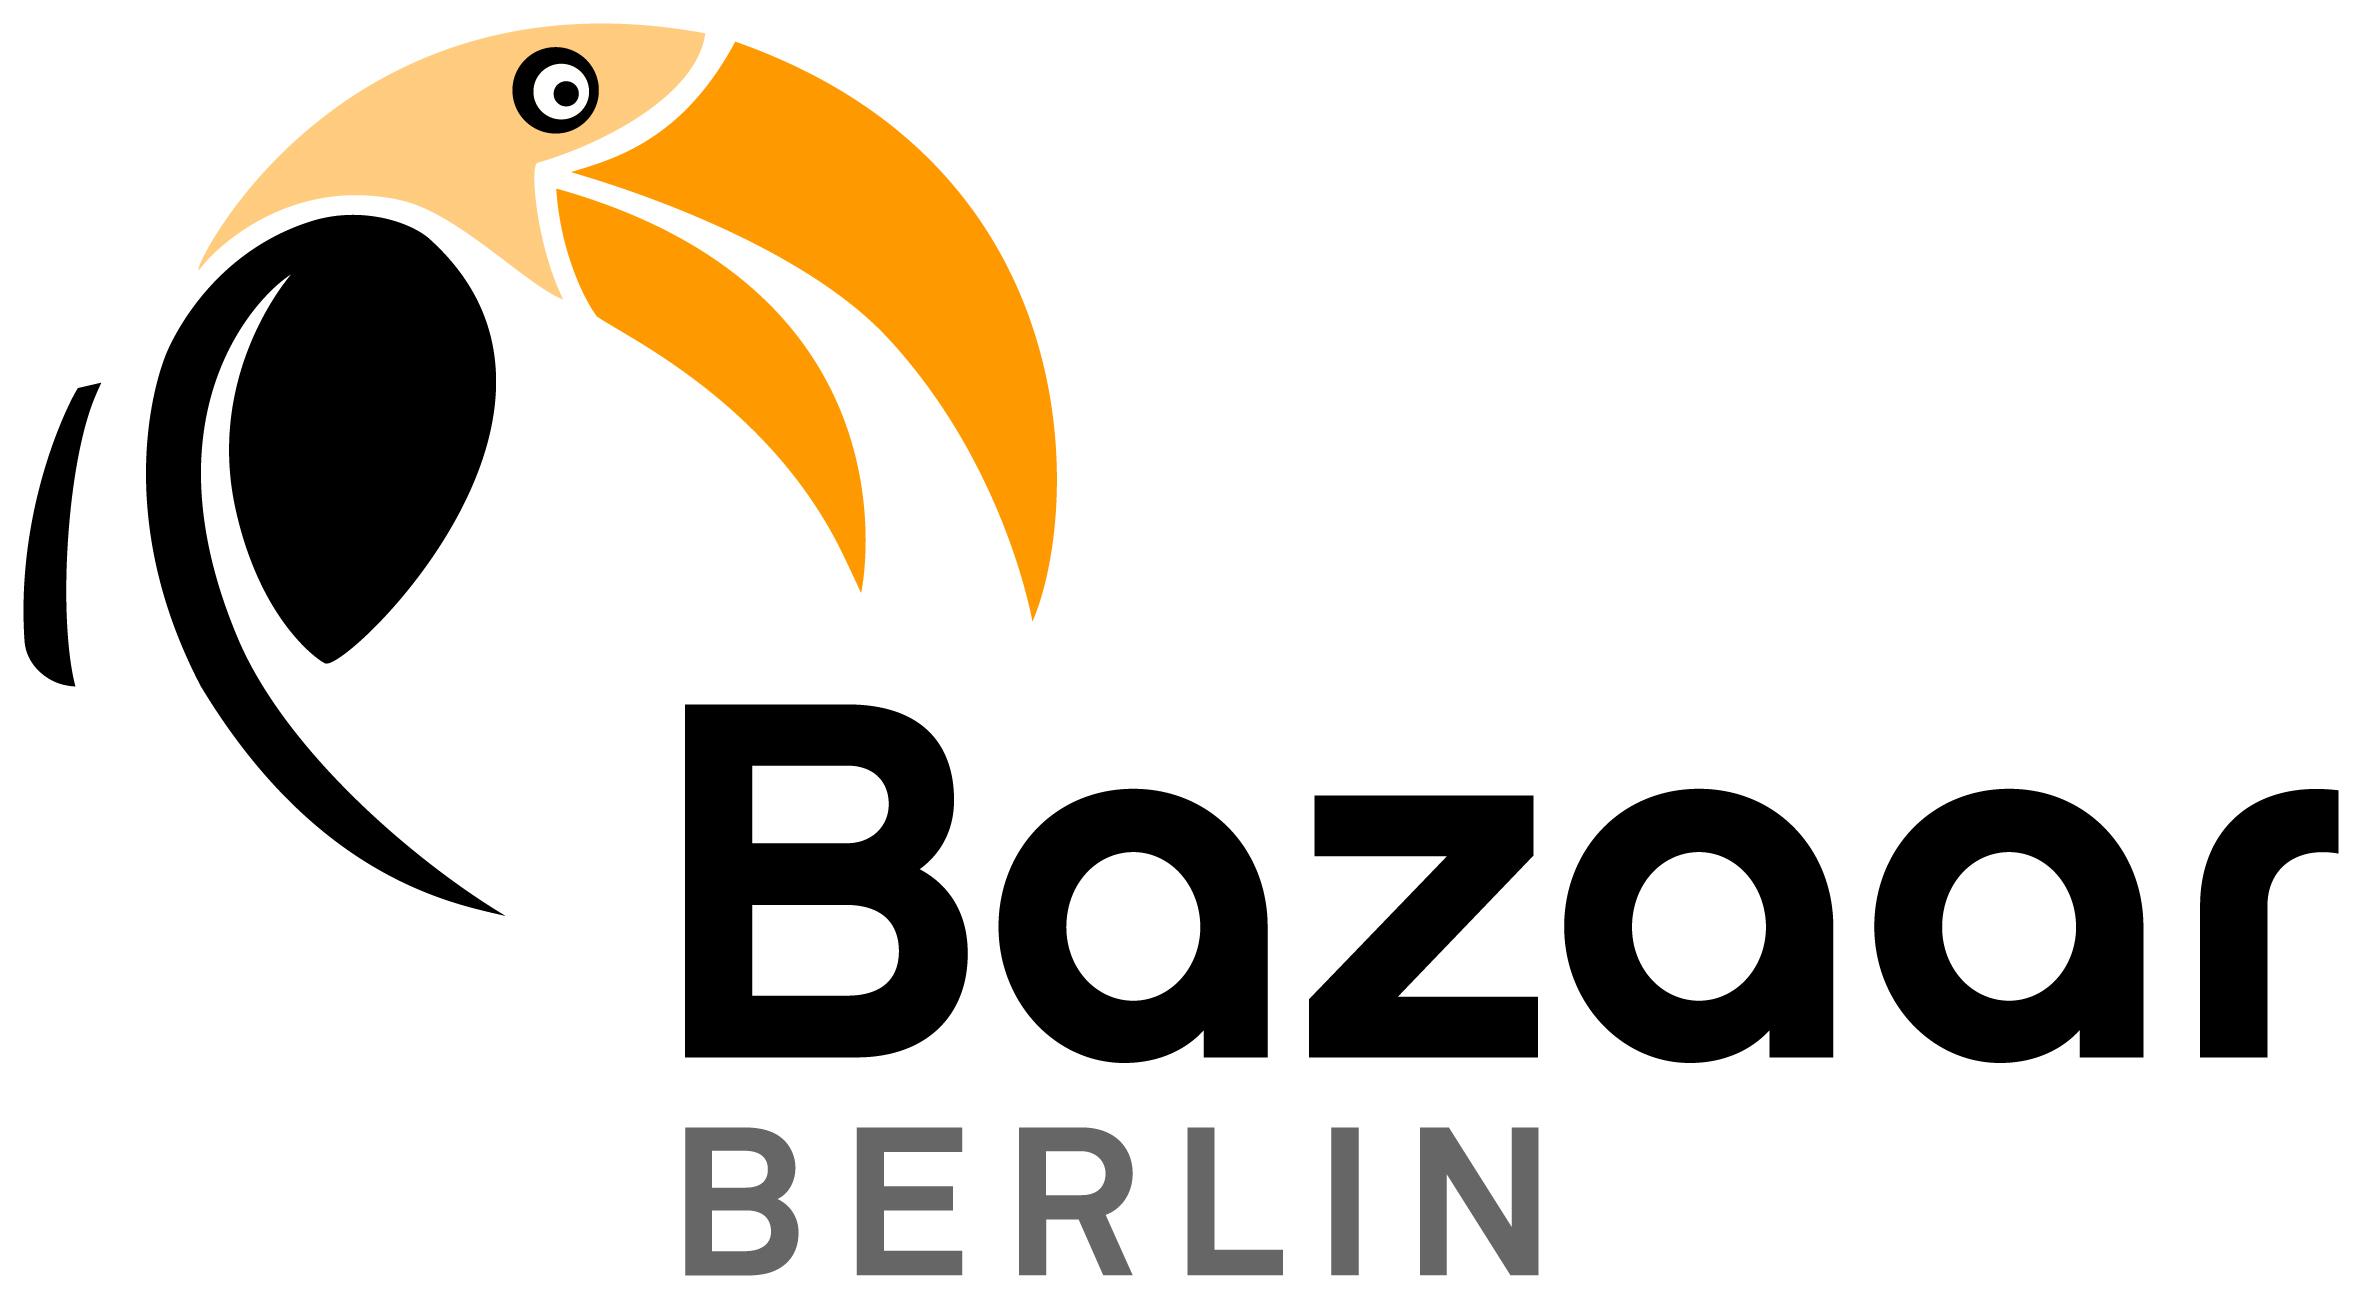 Источник: Visit Berlin http://visitberlin.de/